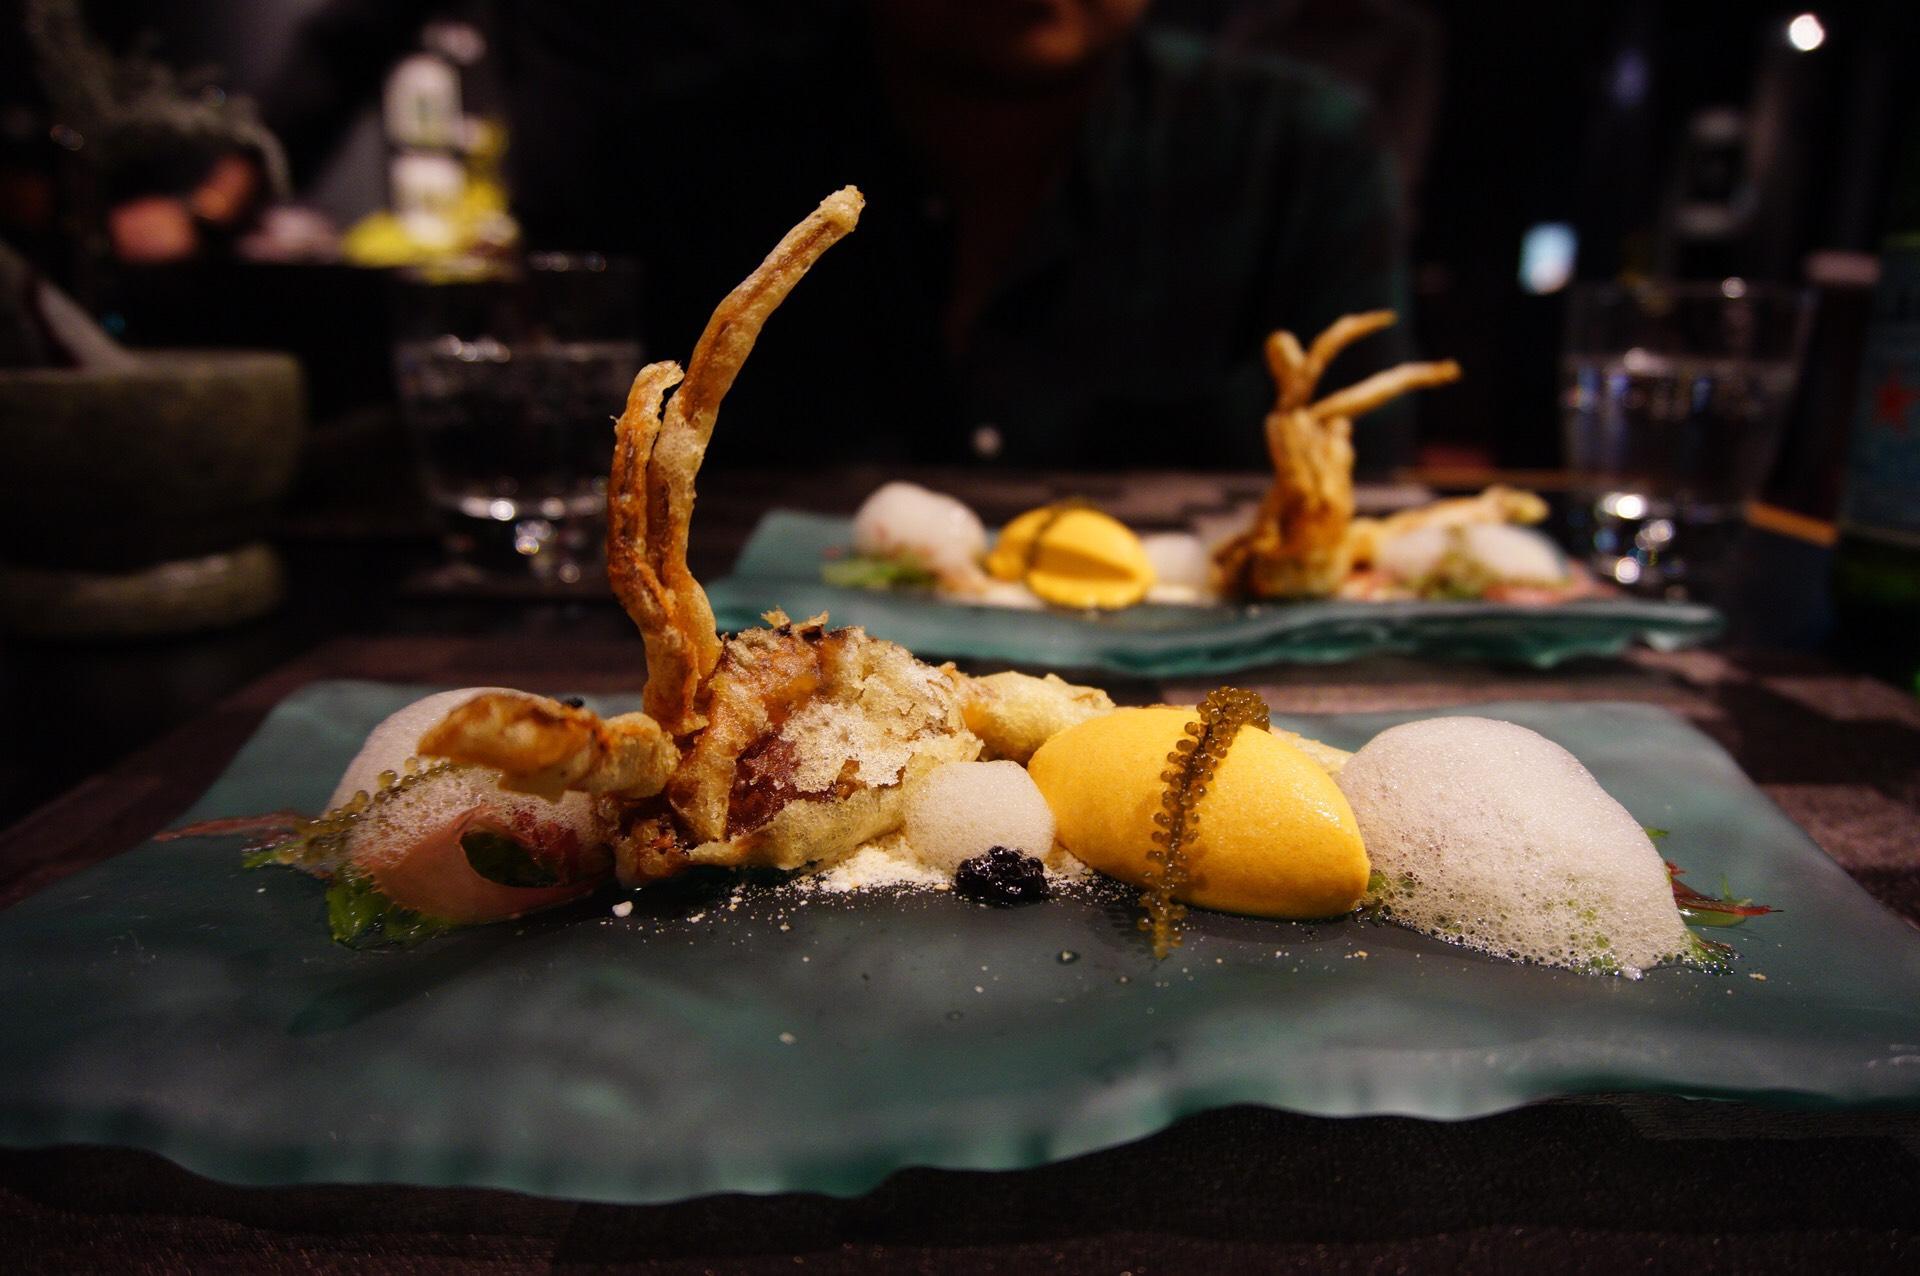 Restaurant Labyrinth Chili Crab